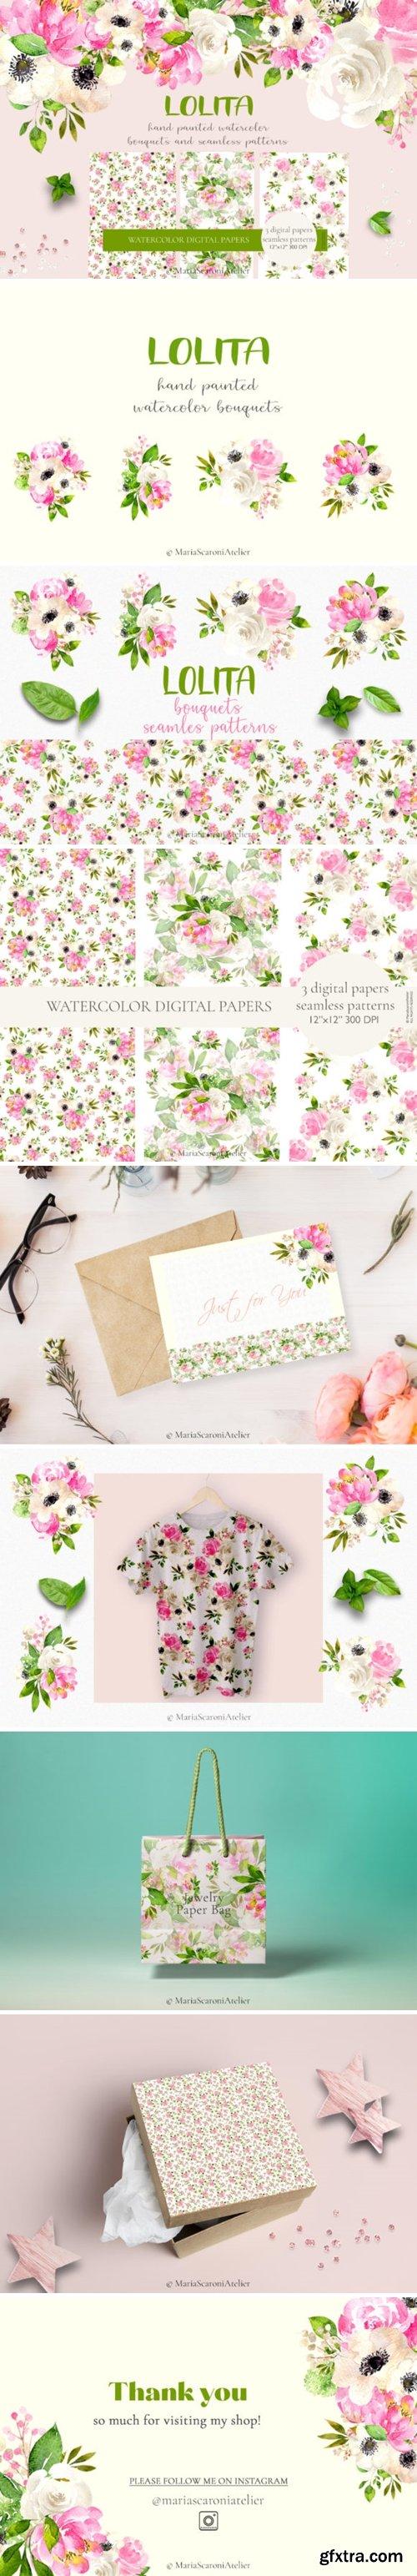 Lolita Watercolor Spring Flowers 3706882